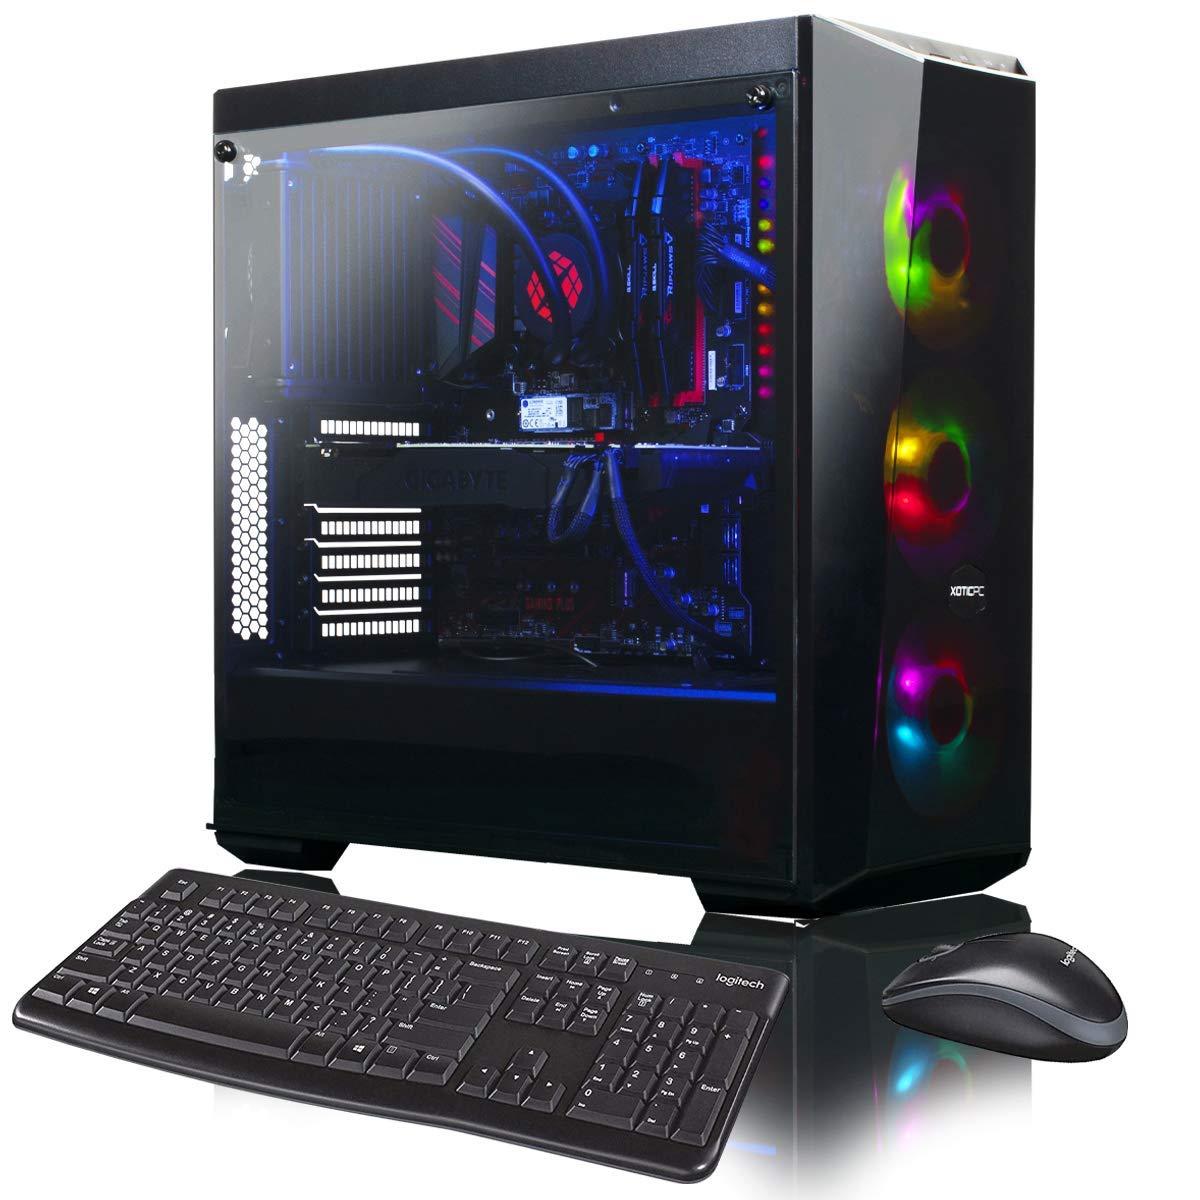 XOTIC Lite 5 (Intel 9th Gen i9-9900K 8-core 5.0GHz Turbo, 32GB DDR4 RAM, 256GB NVMe SSD + 2TB HDD, GTX 1660 6GB, Windows 10) Liquid Cooled Gaming Desktop PC